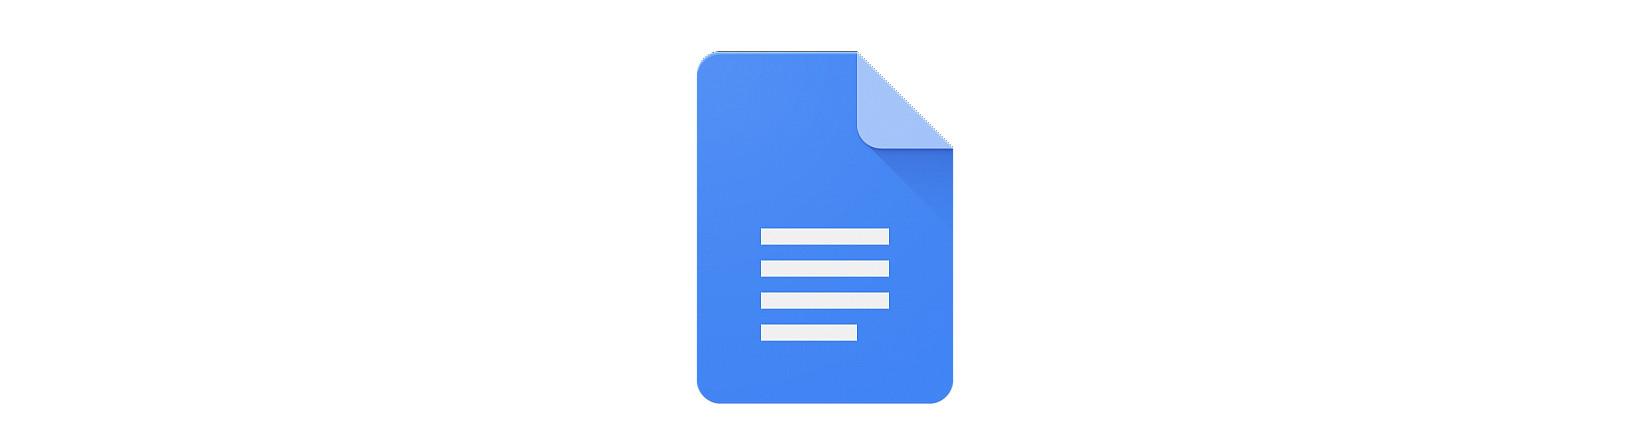 Google Docs: Änderungen nachverfolgen